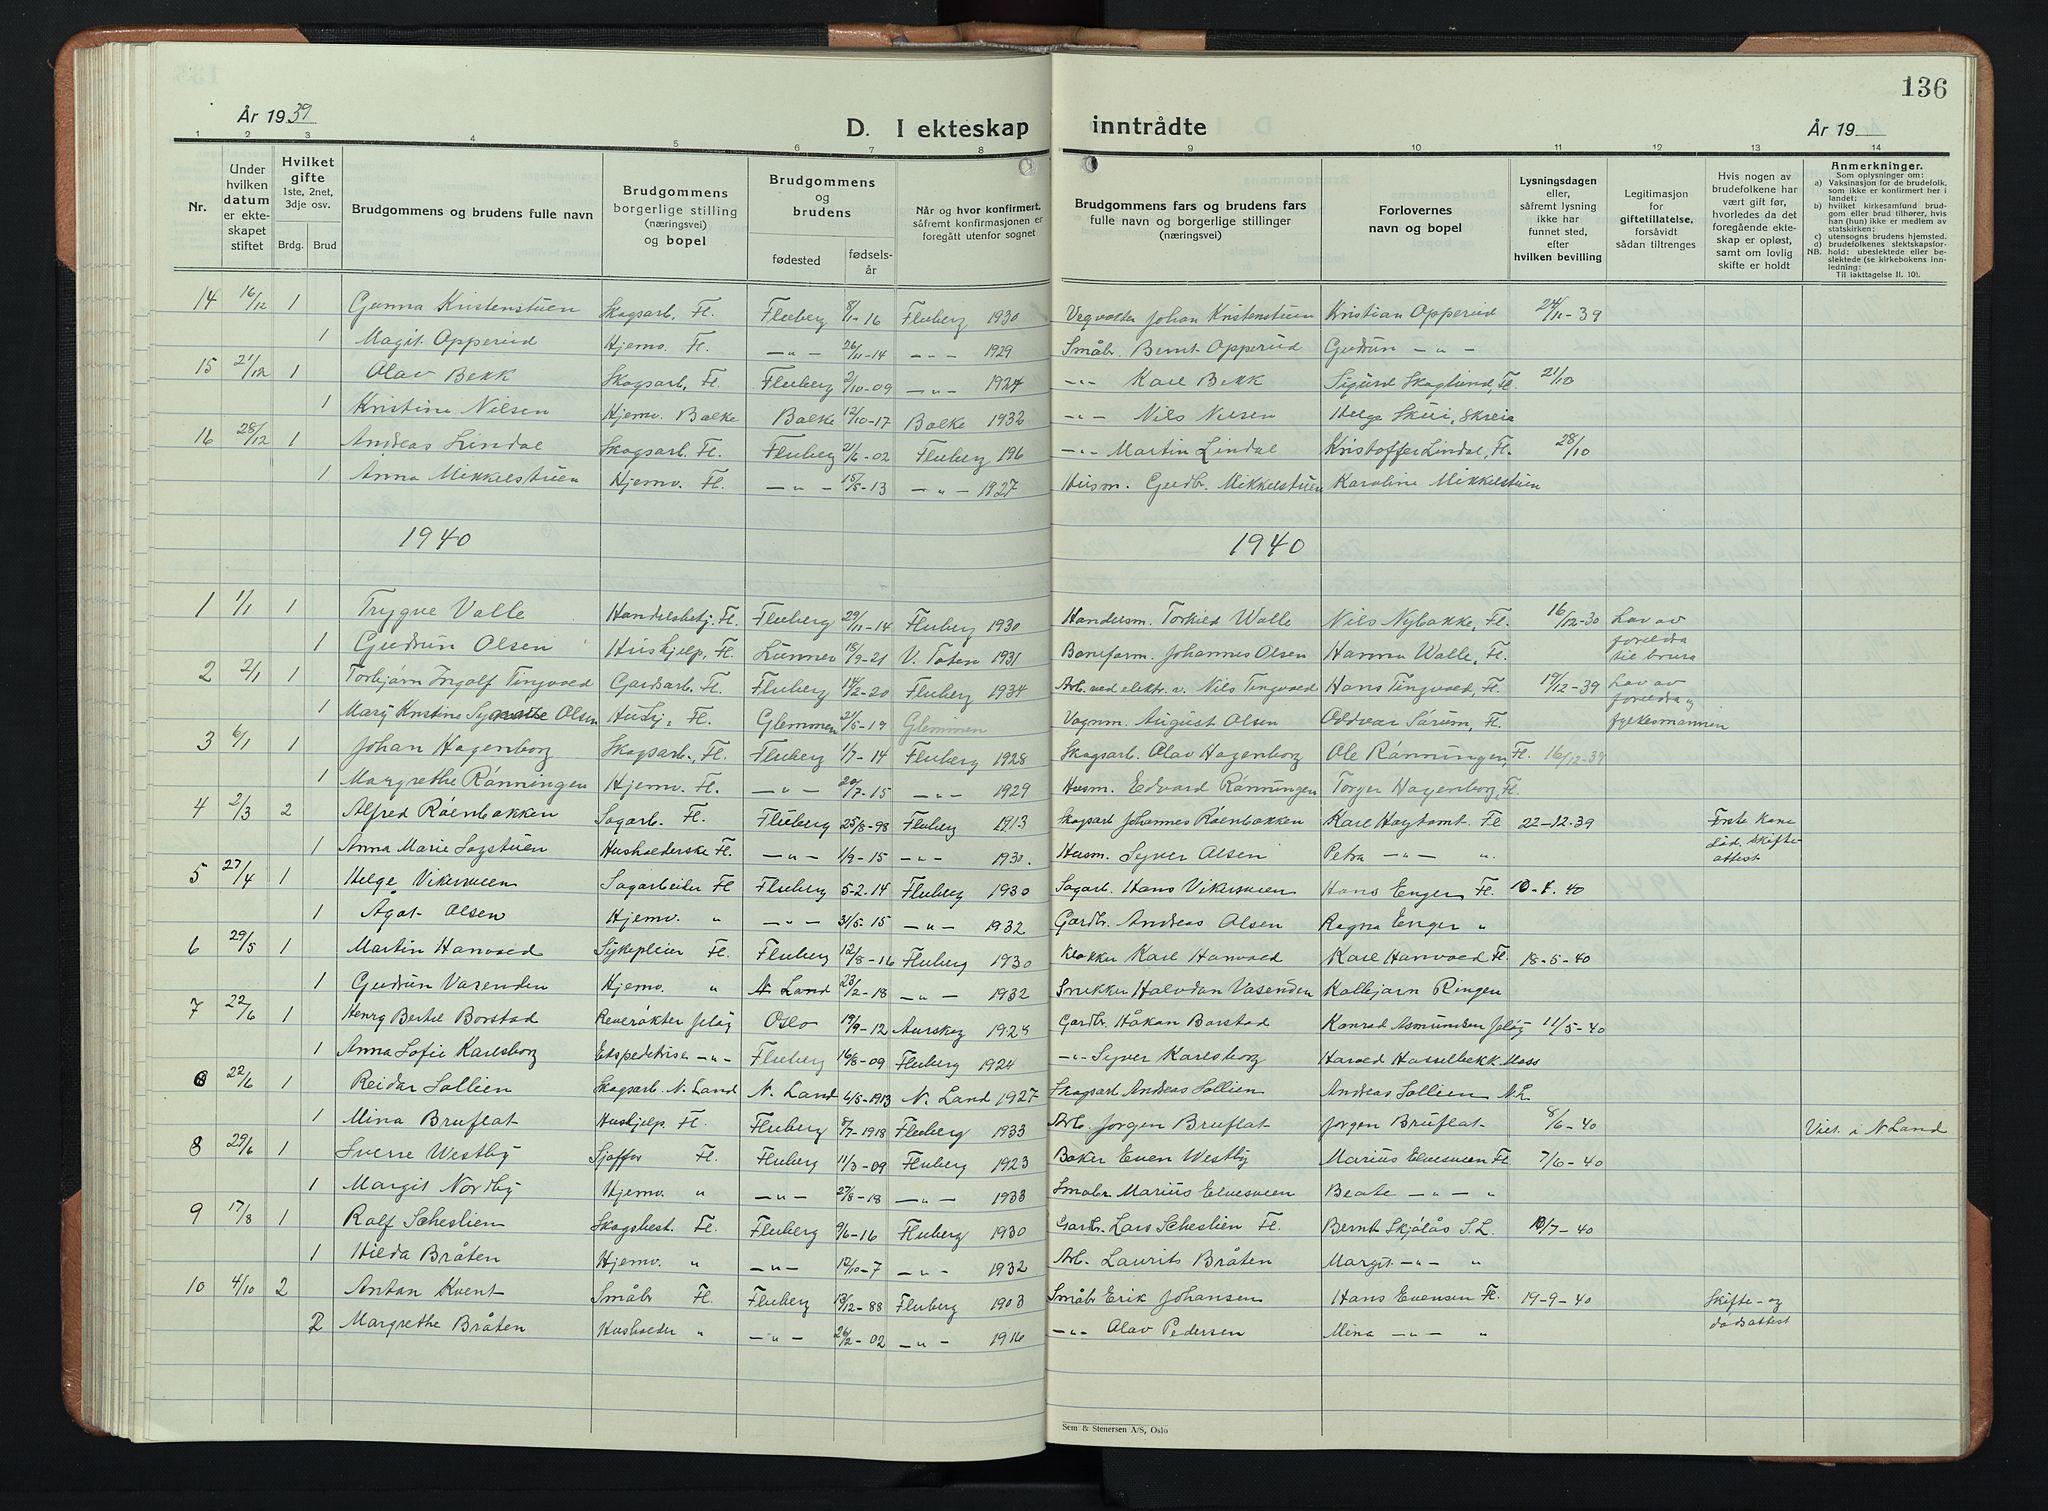 SAH, Søndre Land prestekontor, L/L0008: Klokkerbok nr. 8, 1926-1950, s. 136